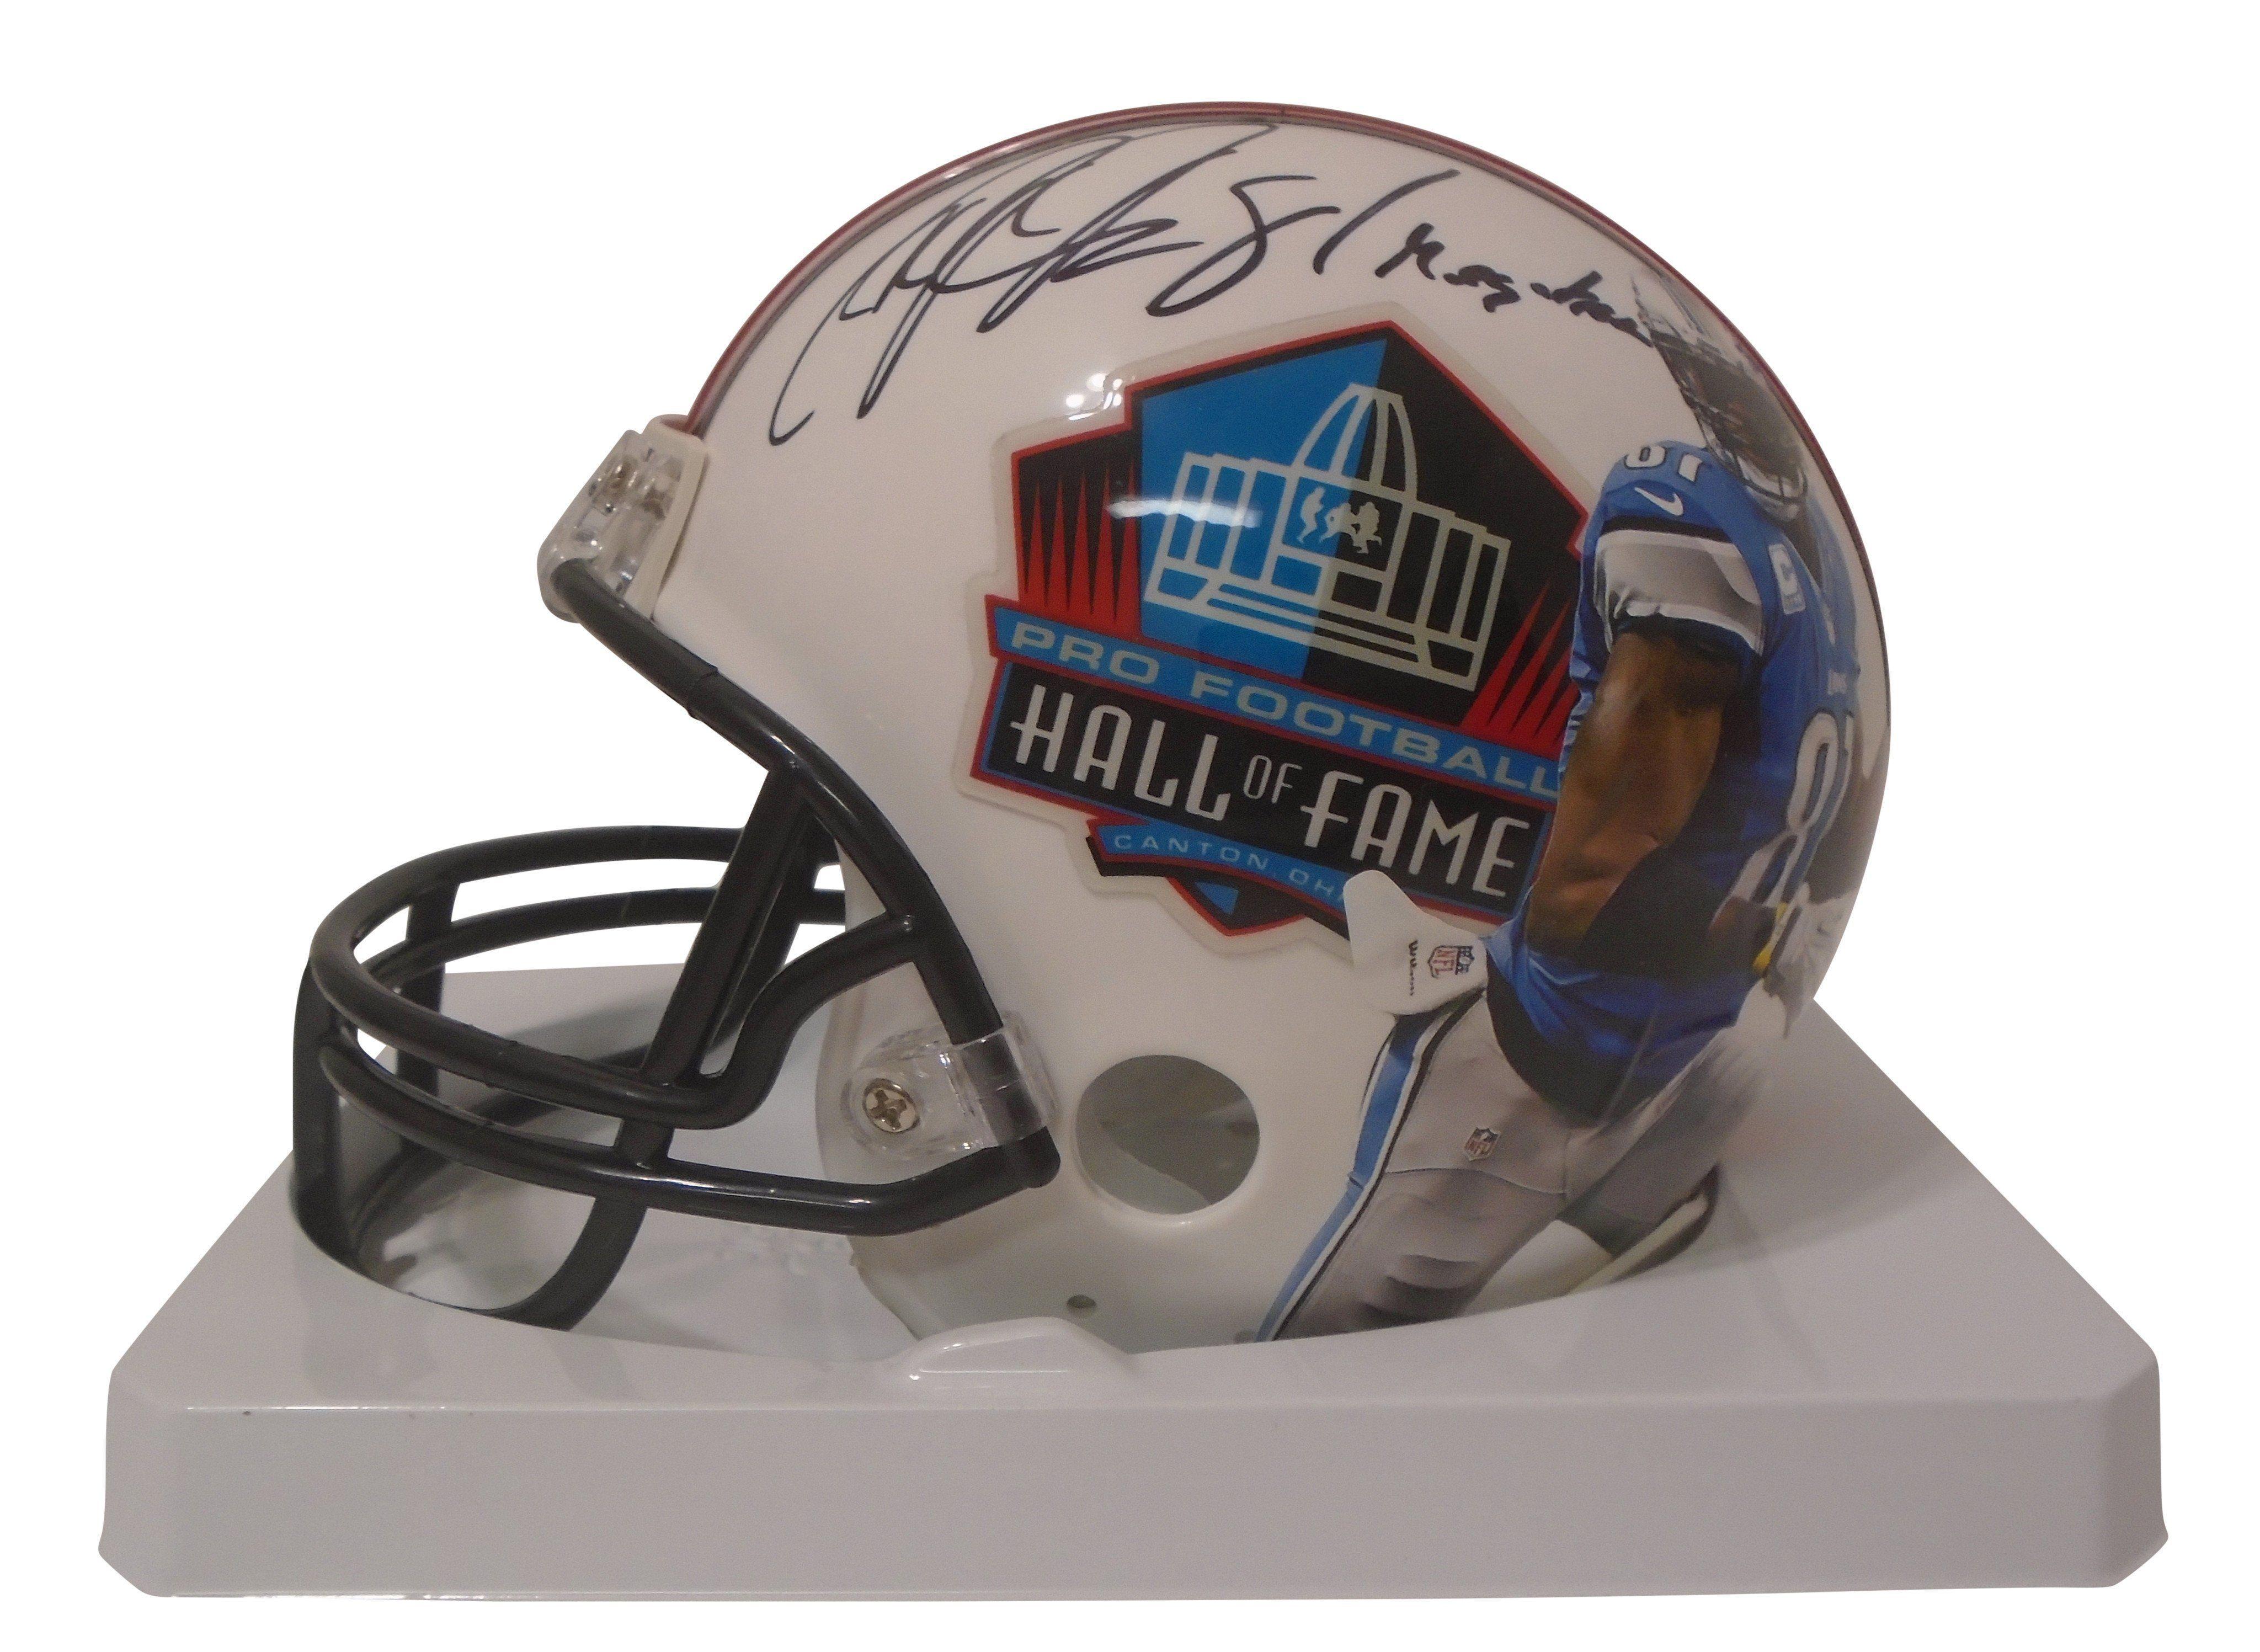 Calvin Johnson Autographed Pro Football Hall of Fame Riddell Mini Football Helmet w/ Inscription, Proof Photo